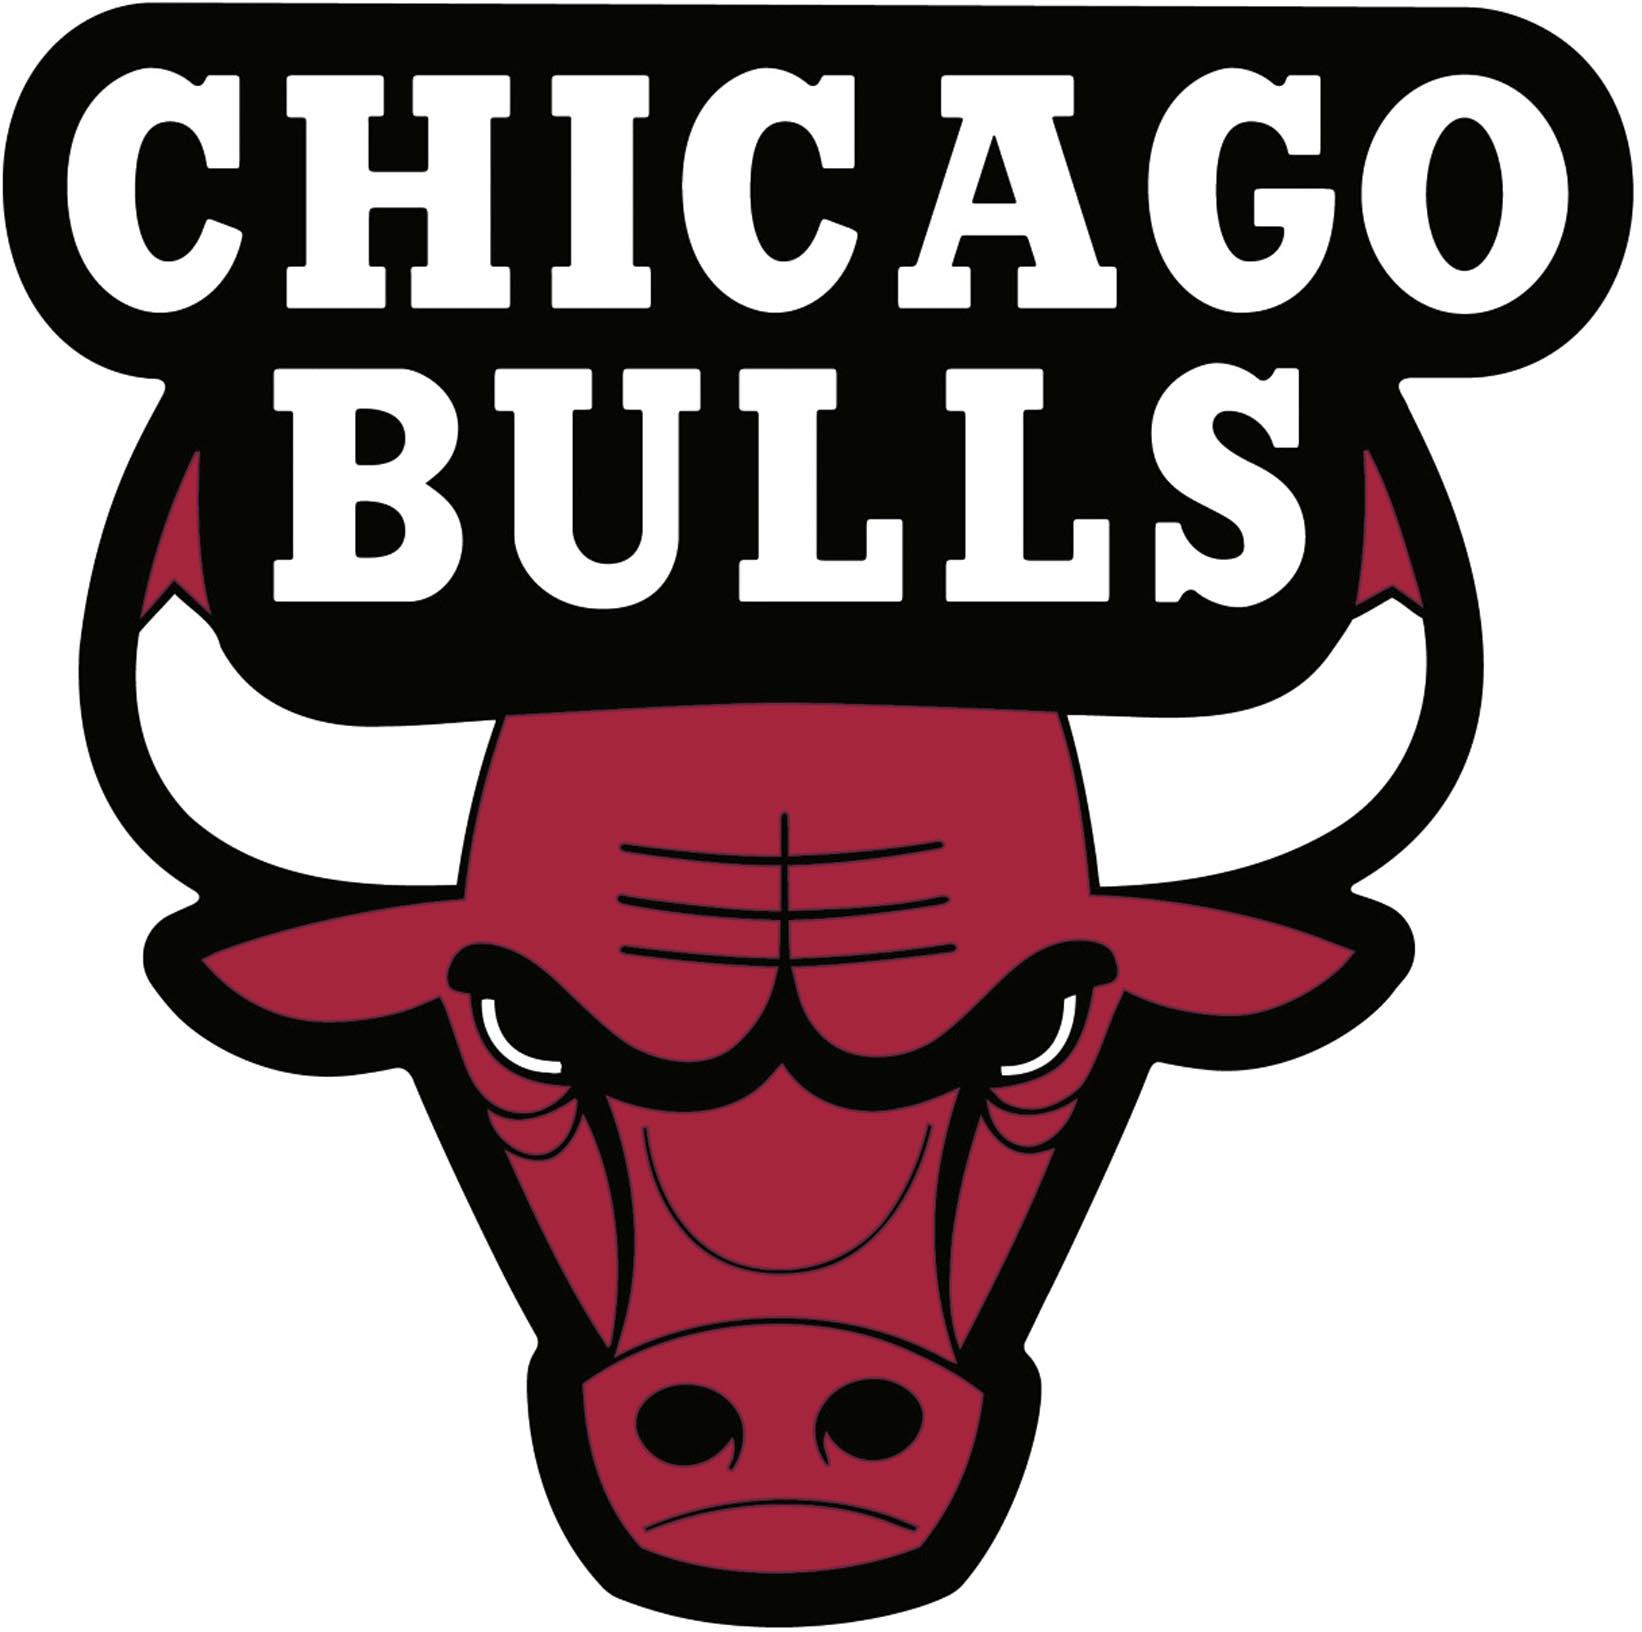 Chicago bulls clipart download.